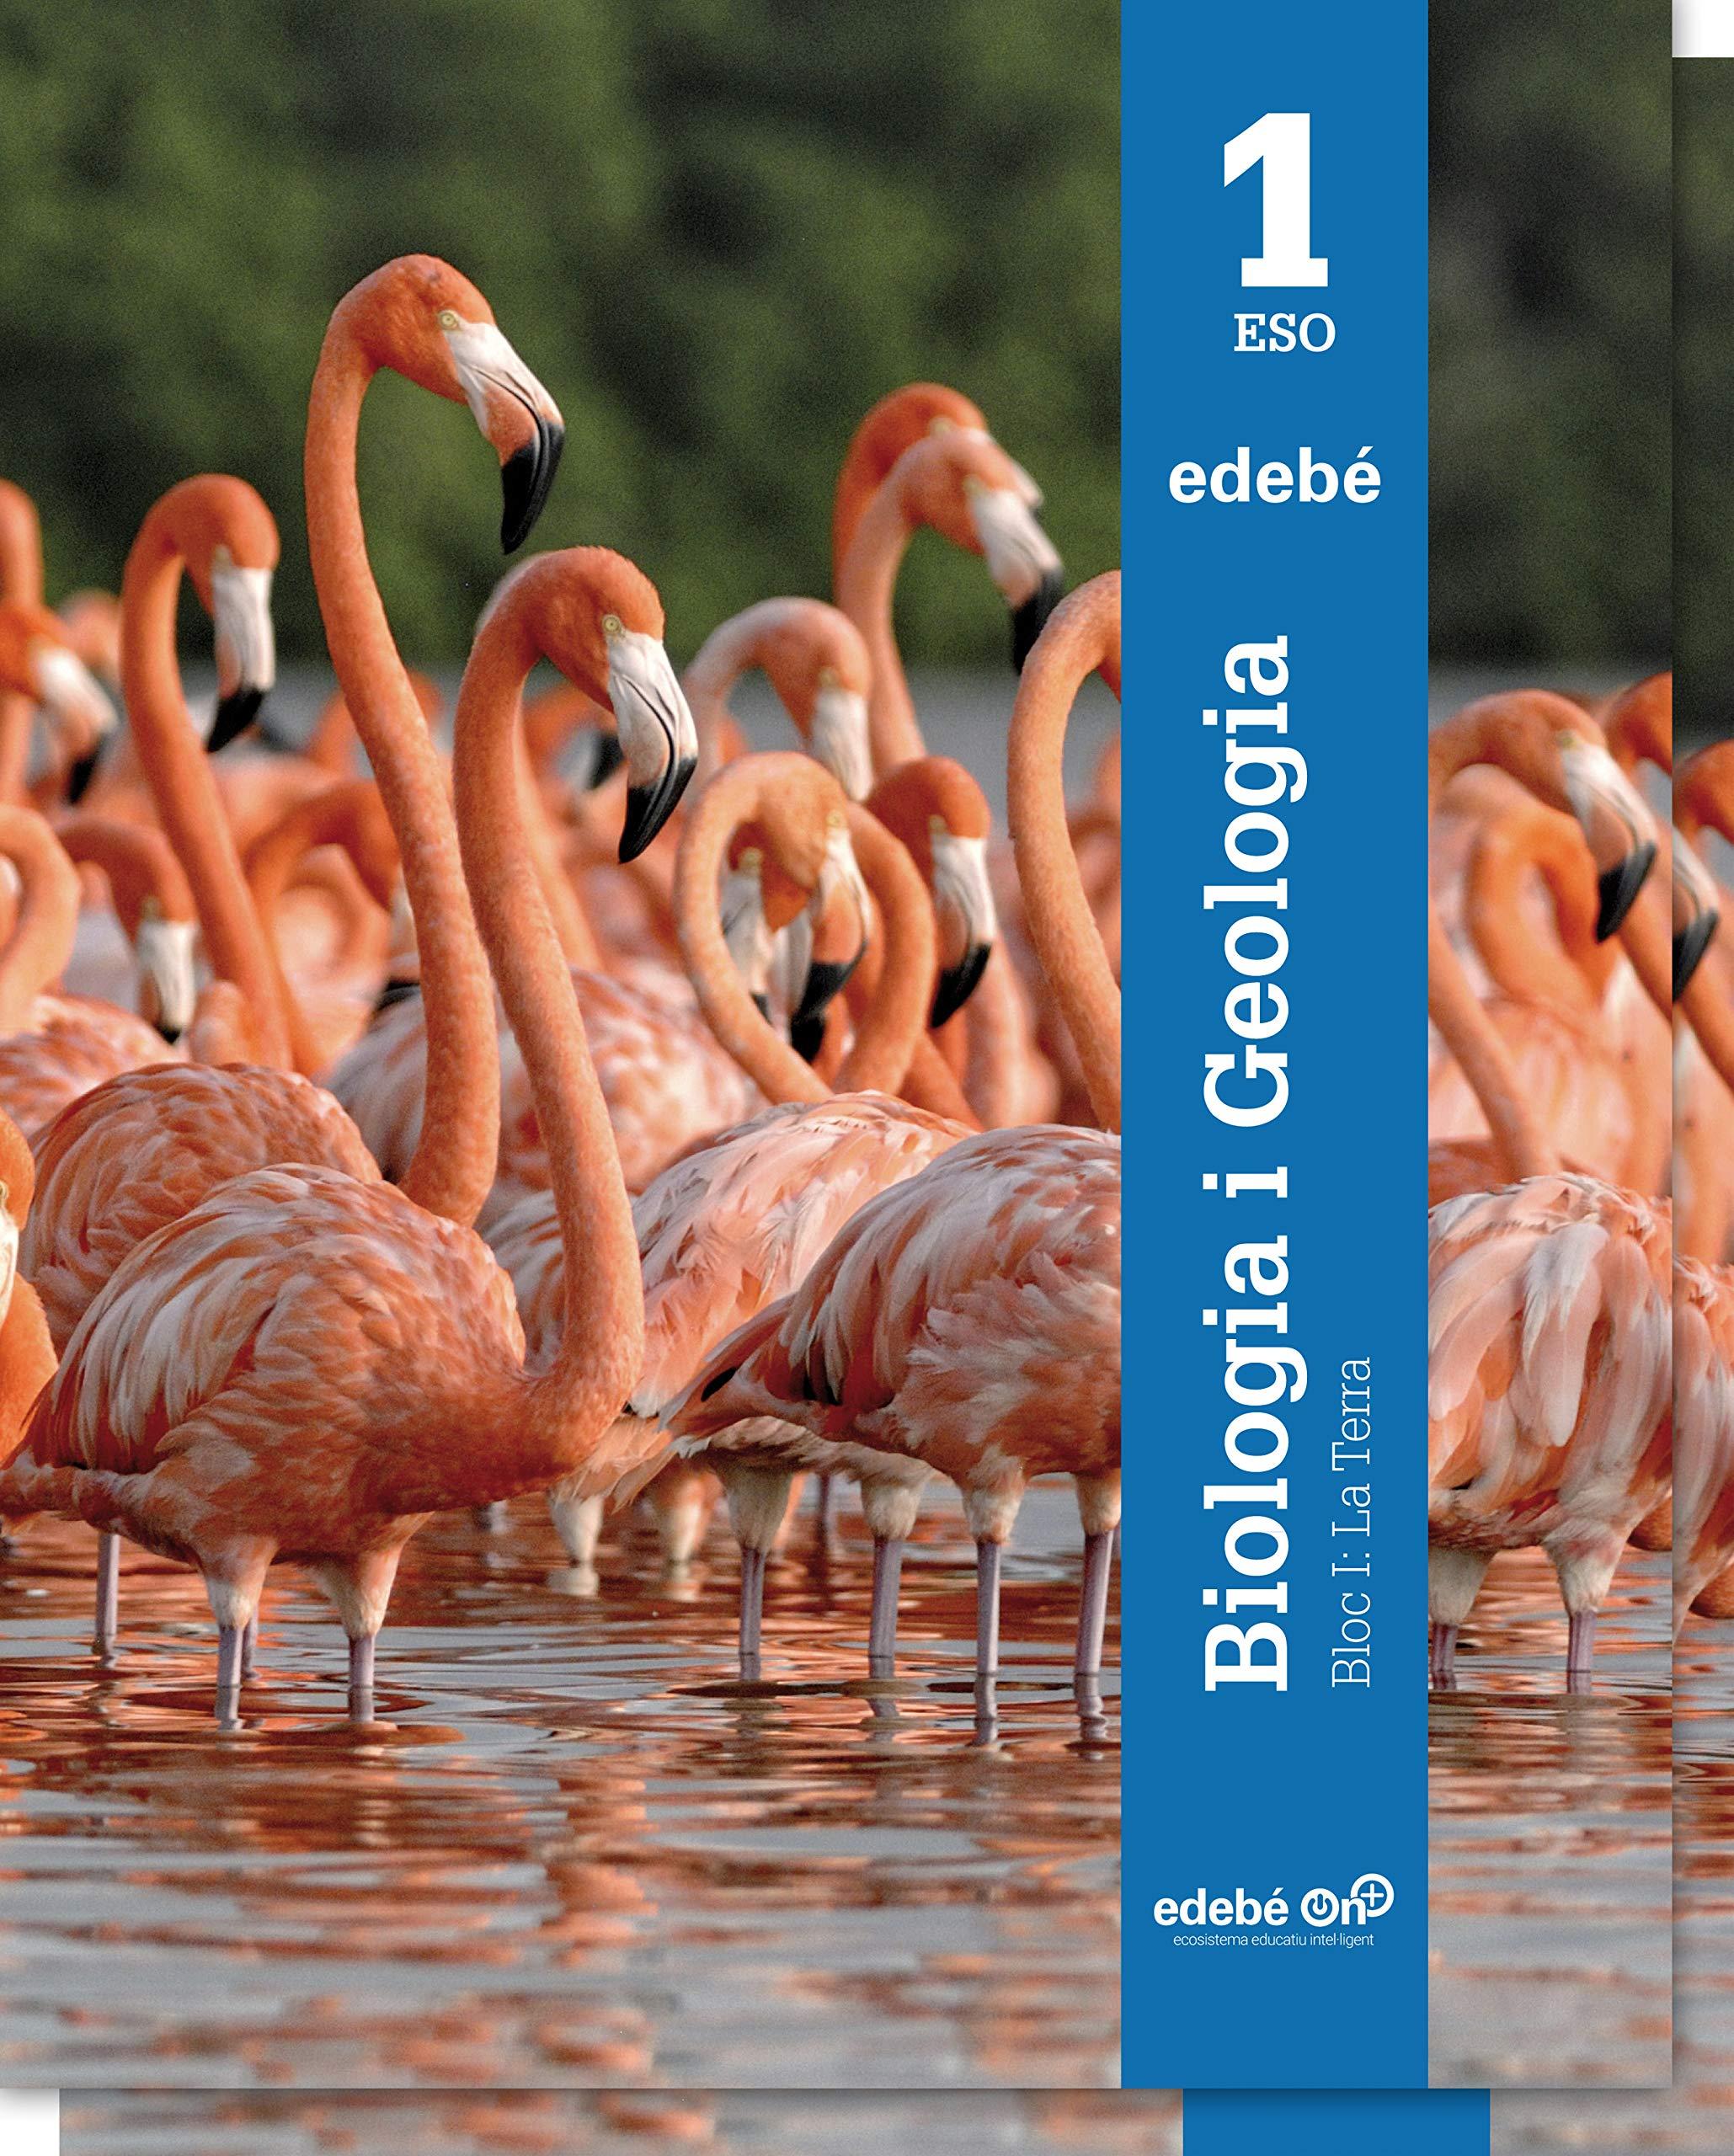 Biologia i Geologia 1 - 9788468320823: Amazon.es: Edebé, Obra ...